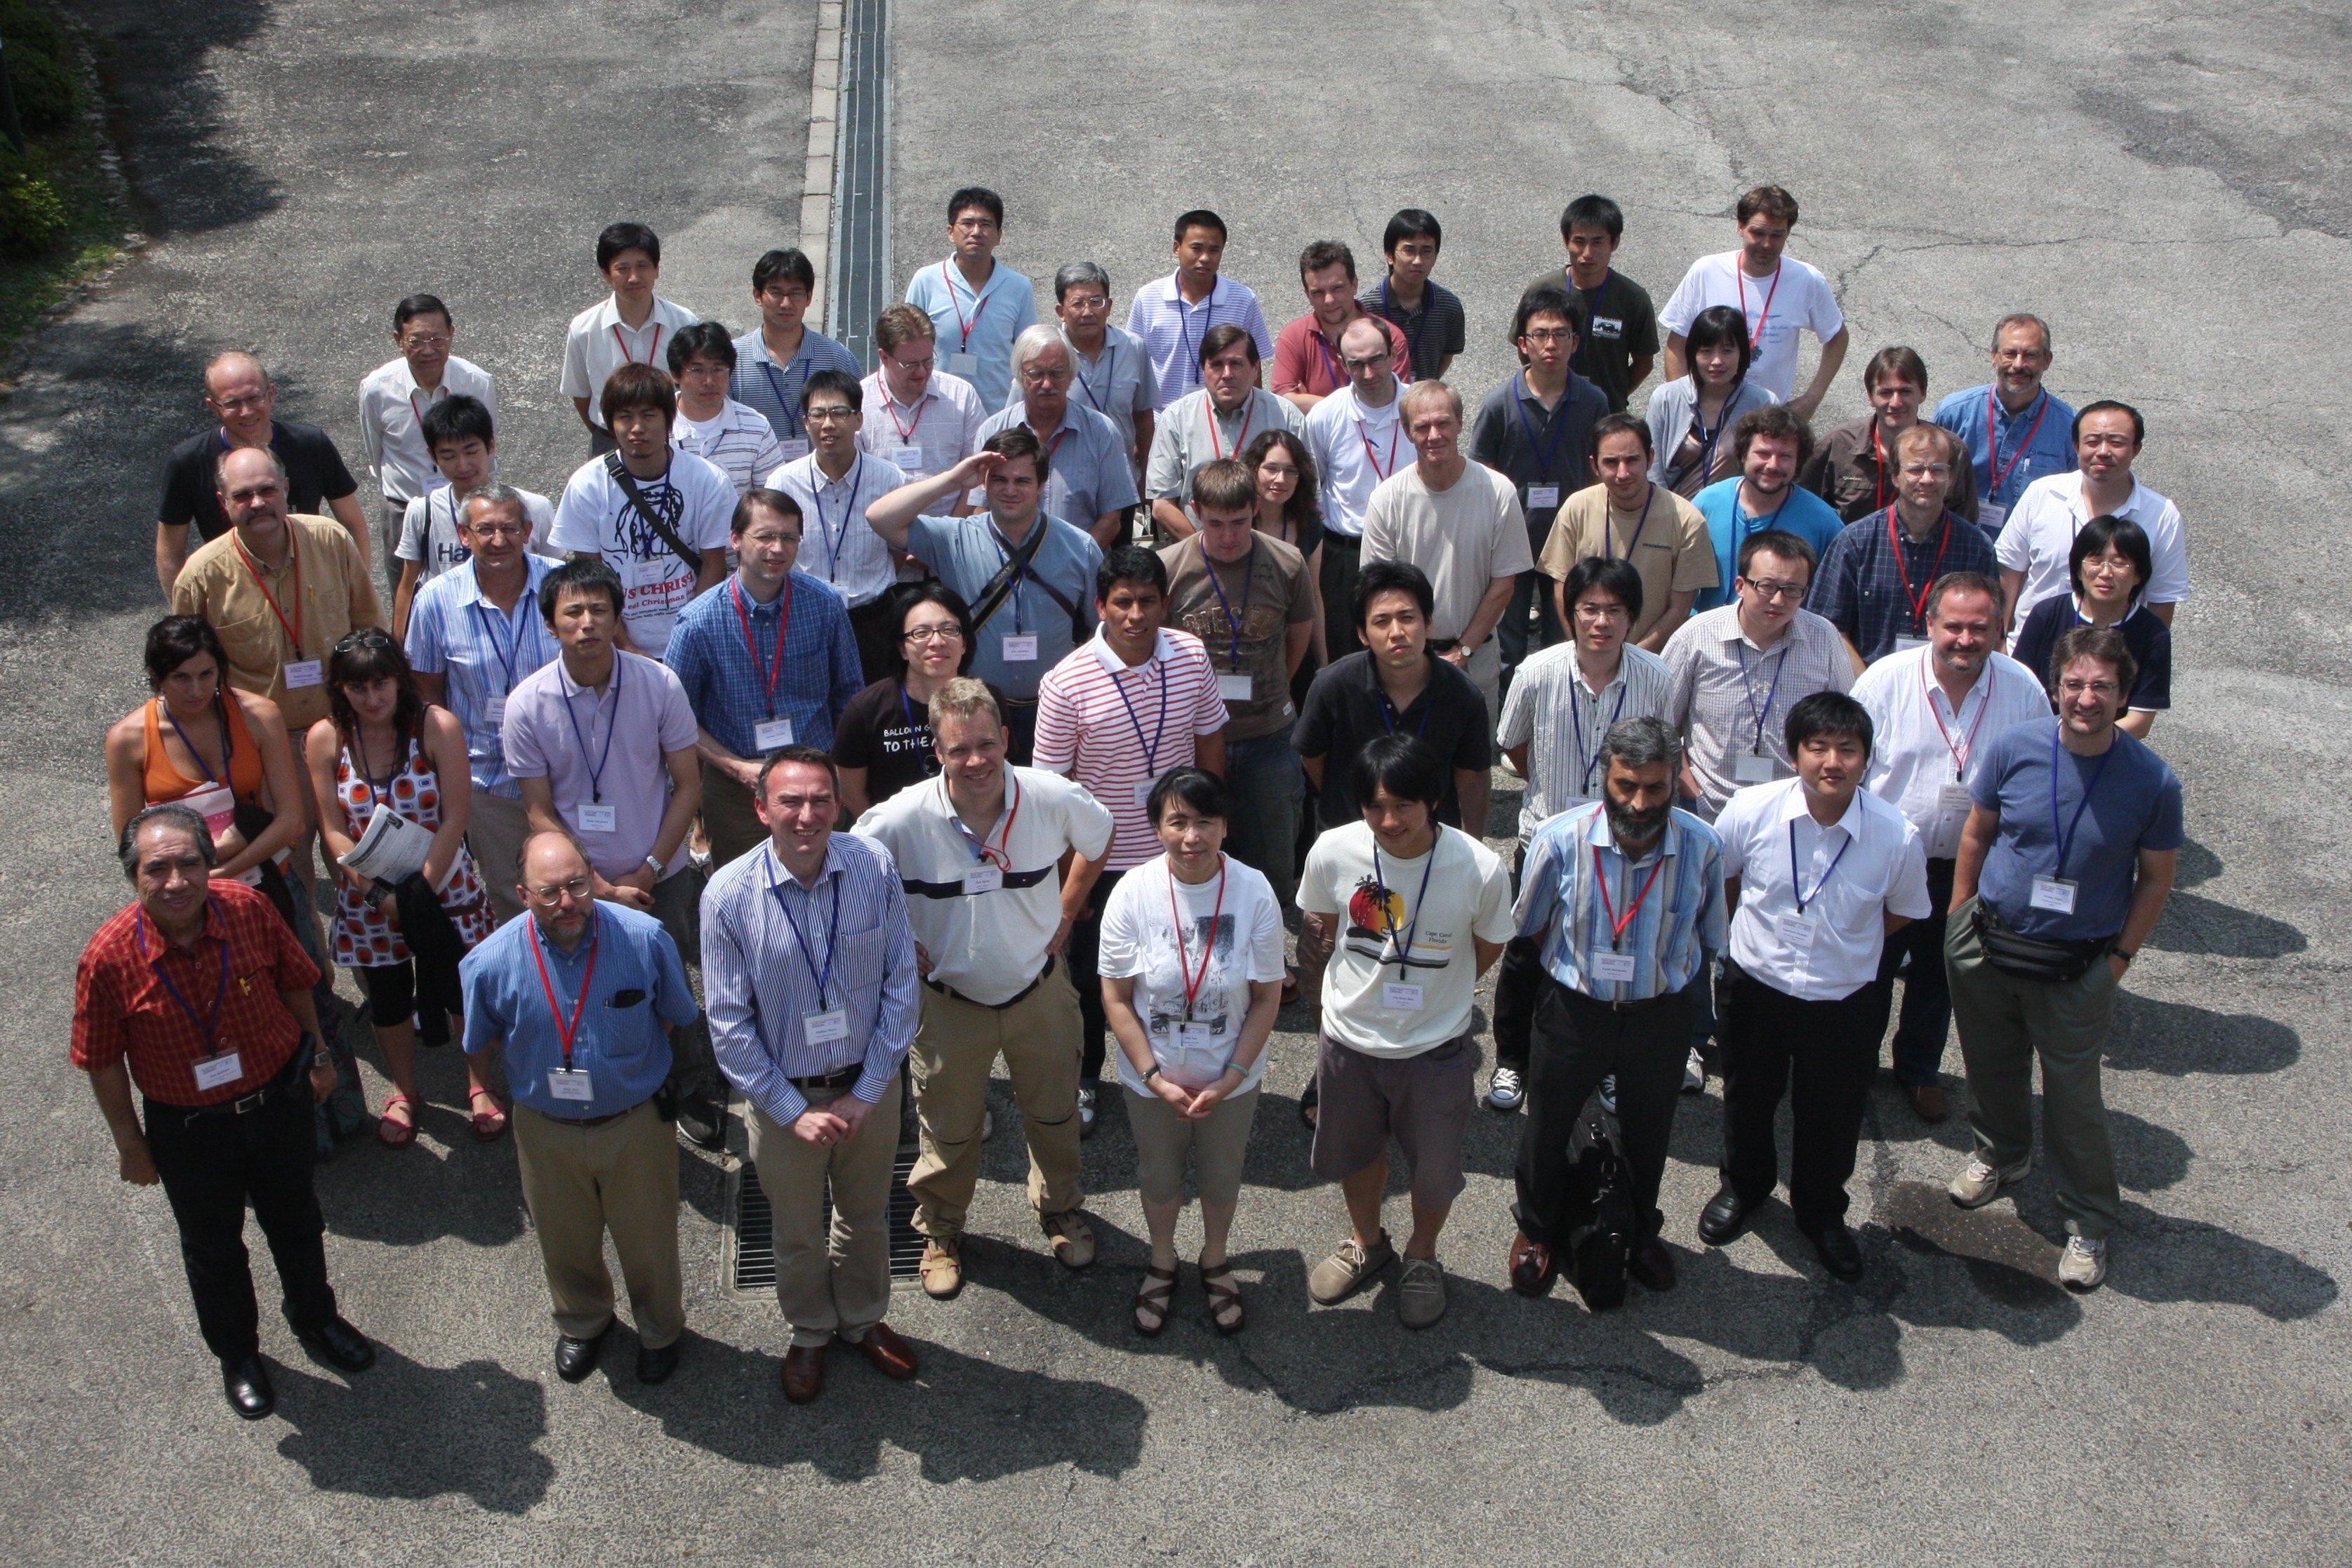 [Kyoto school group photo]